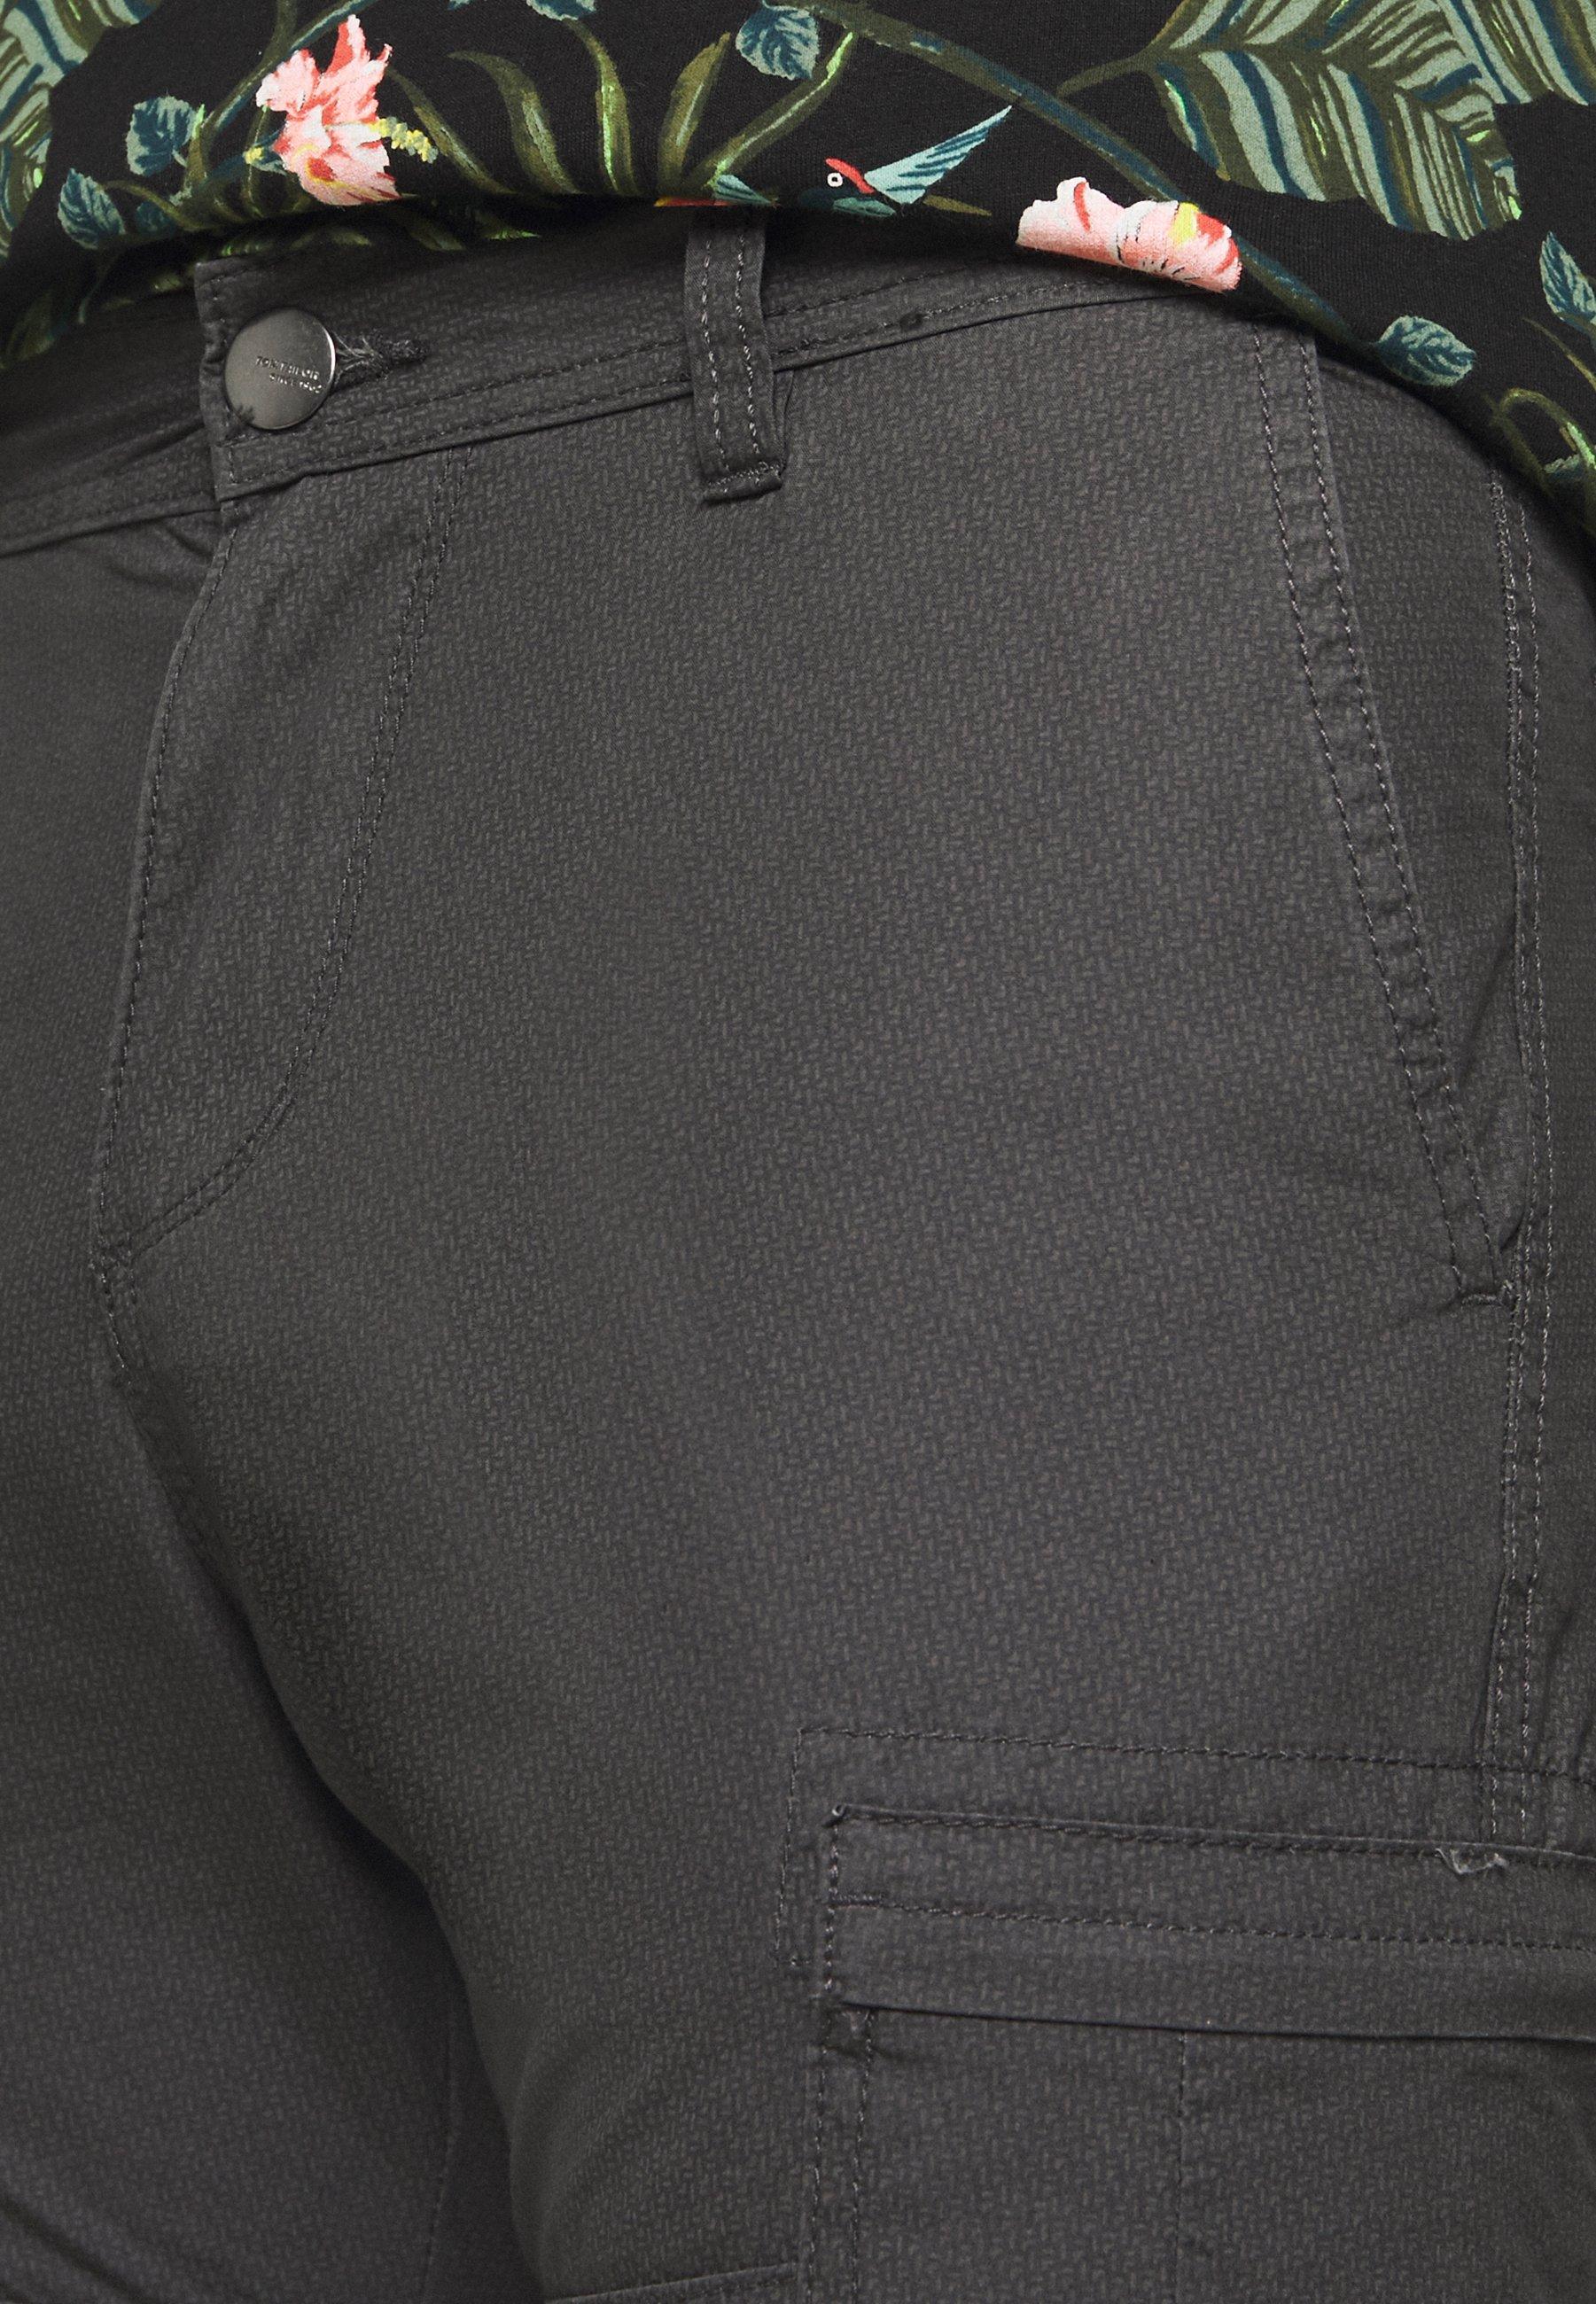 Tom Tailor Bermuda - Shortsit Grey Mini Geo Design